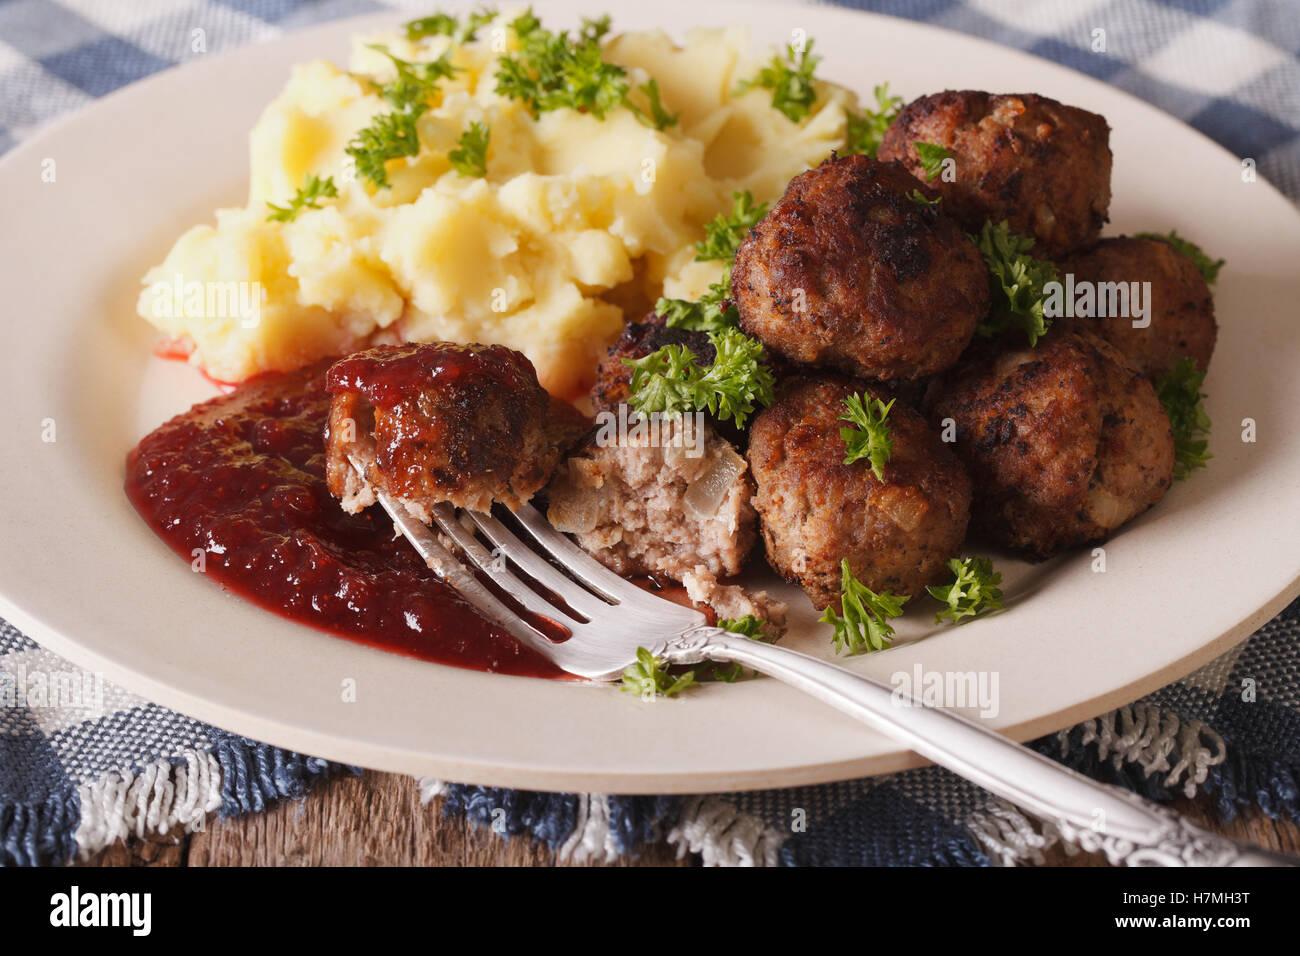 Swedish meatballs kottbullar, lingonberry sauce with a side dish mashed potato on the plate closeup. horizontal - Stock Image